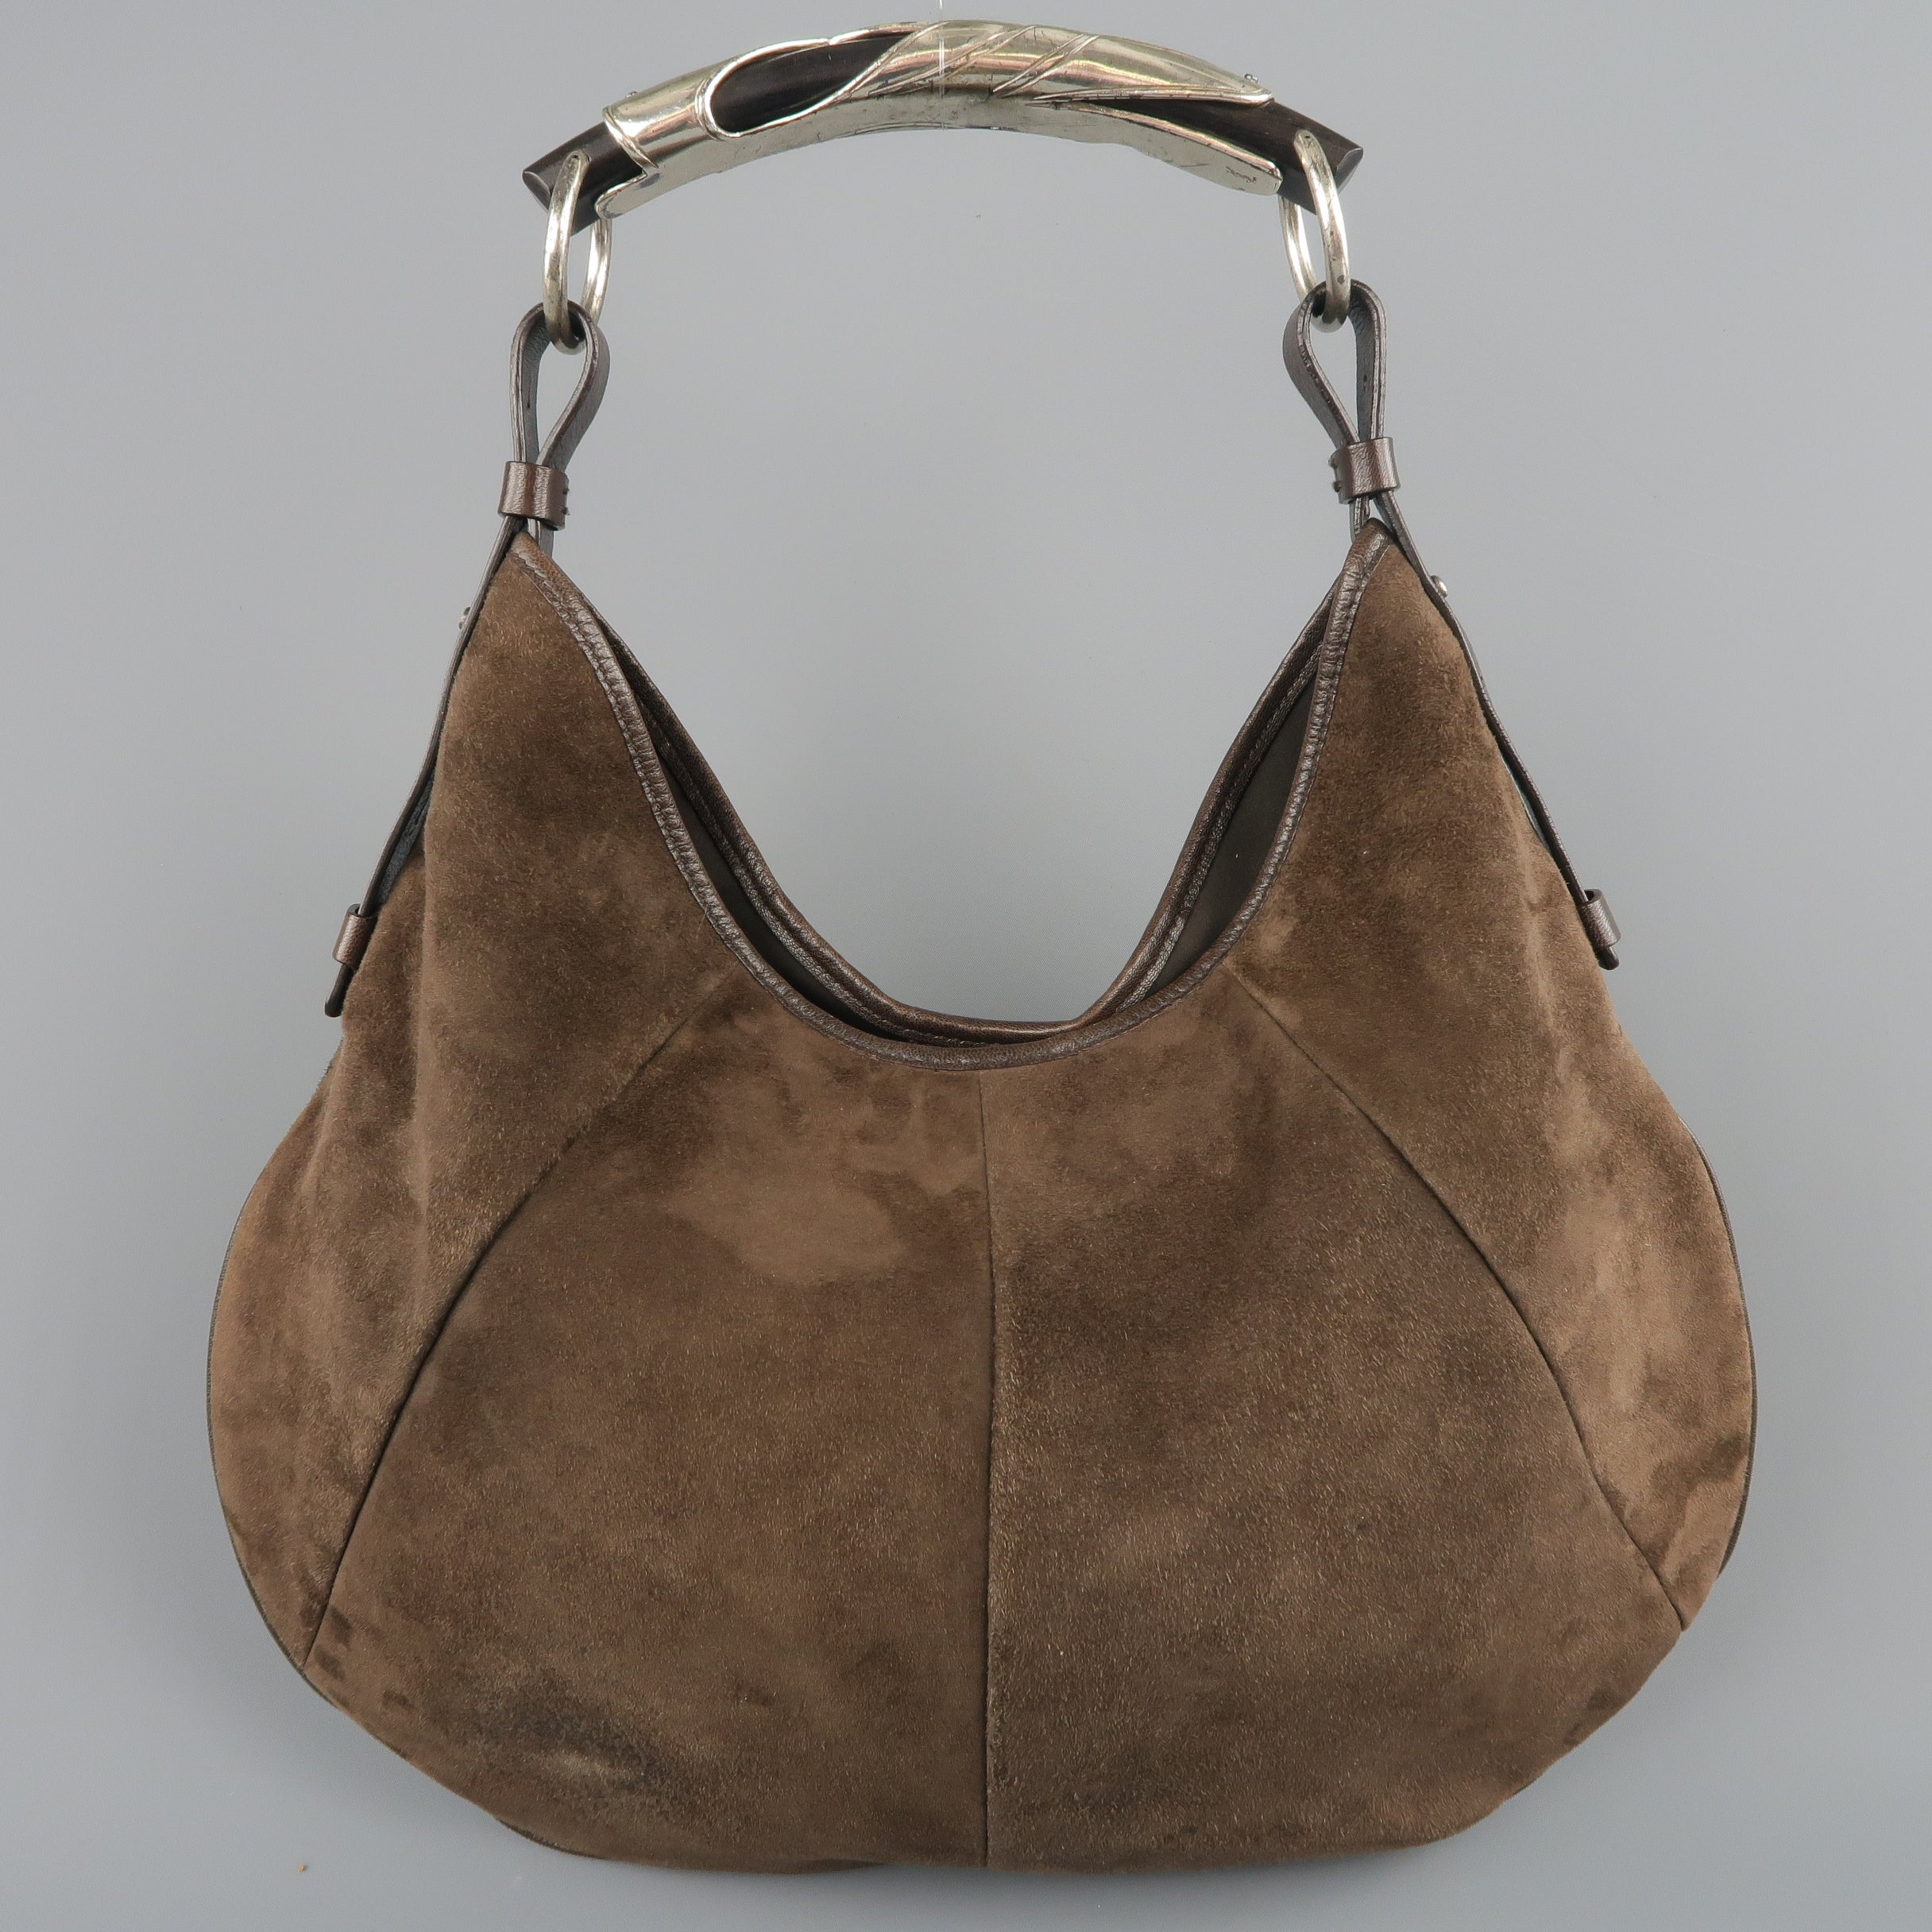 1a4d1e758c Yves Saint Laurent Brown Suede Silver Metal Handle Mombasa Handbag at  1stdibs